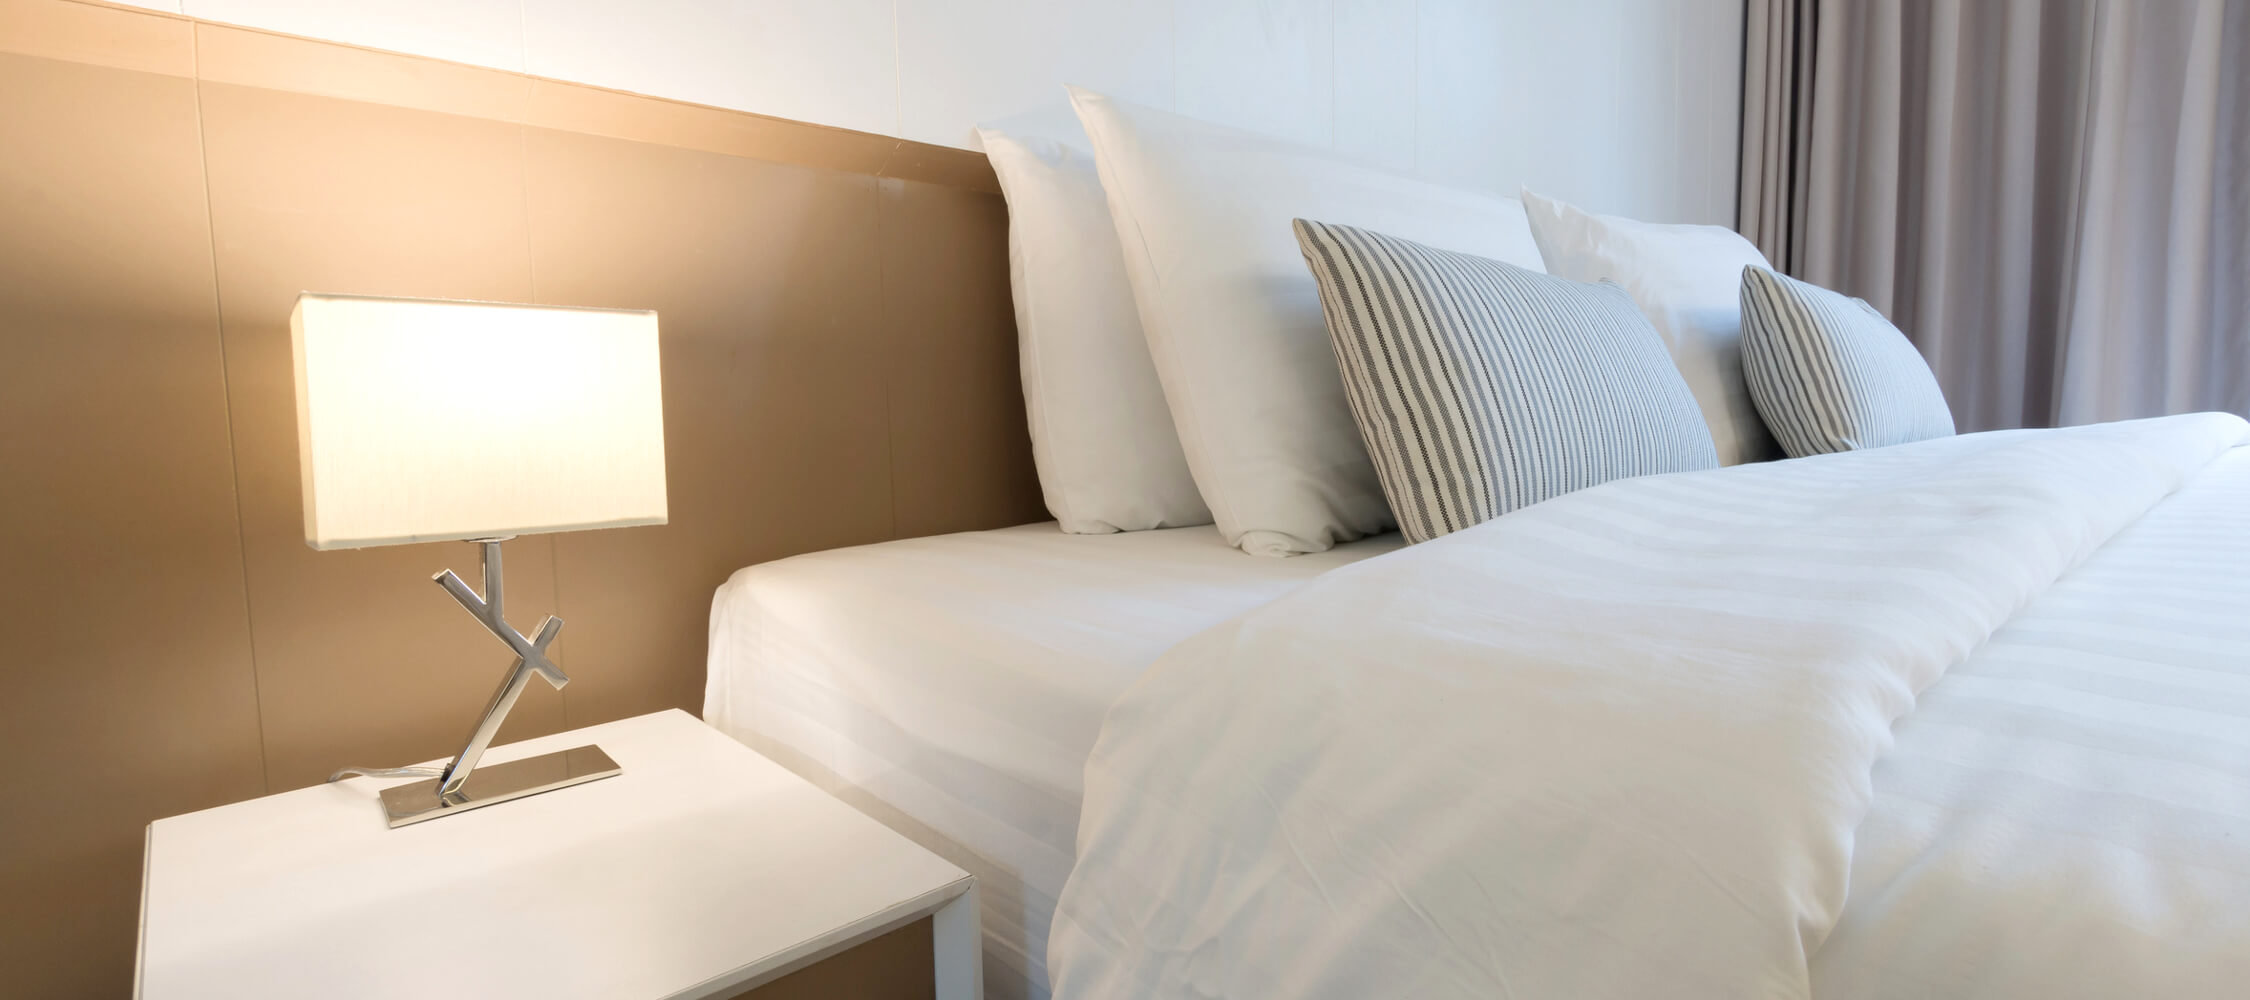 Hotel_Flora_Merano_Rooms_Superior_Doppelzimmer_Calla_155080777_2250x1000